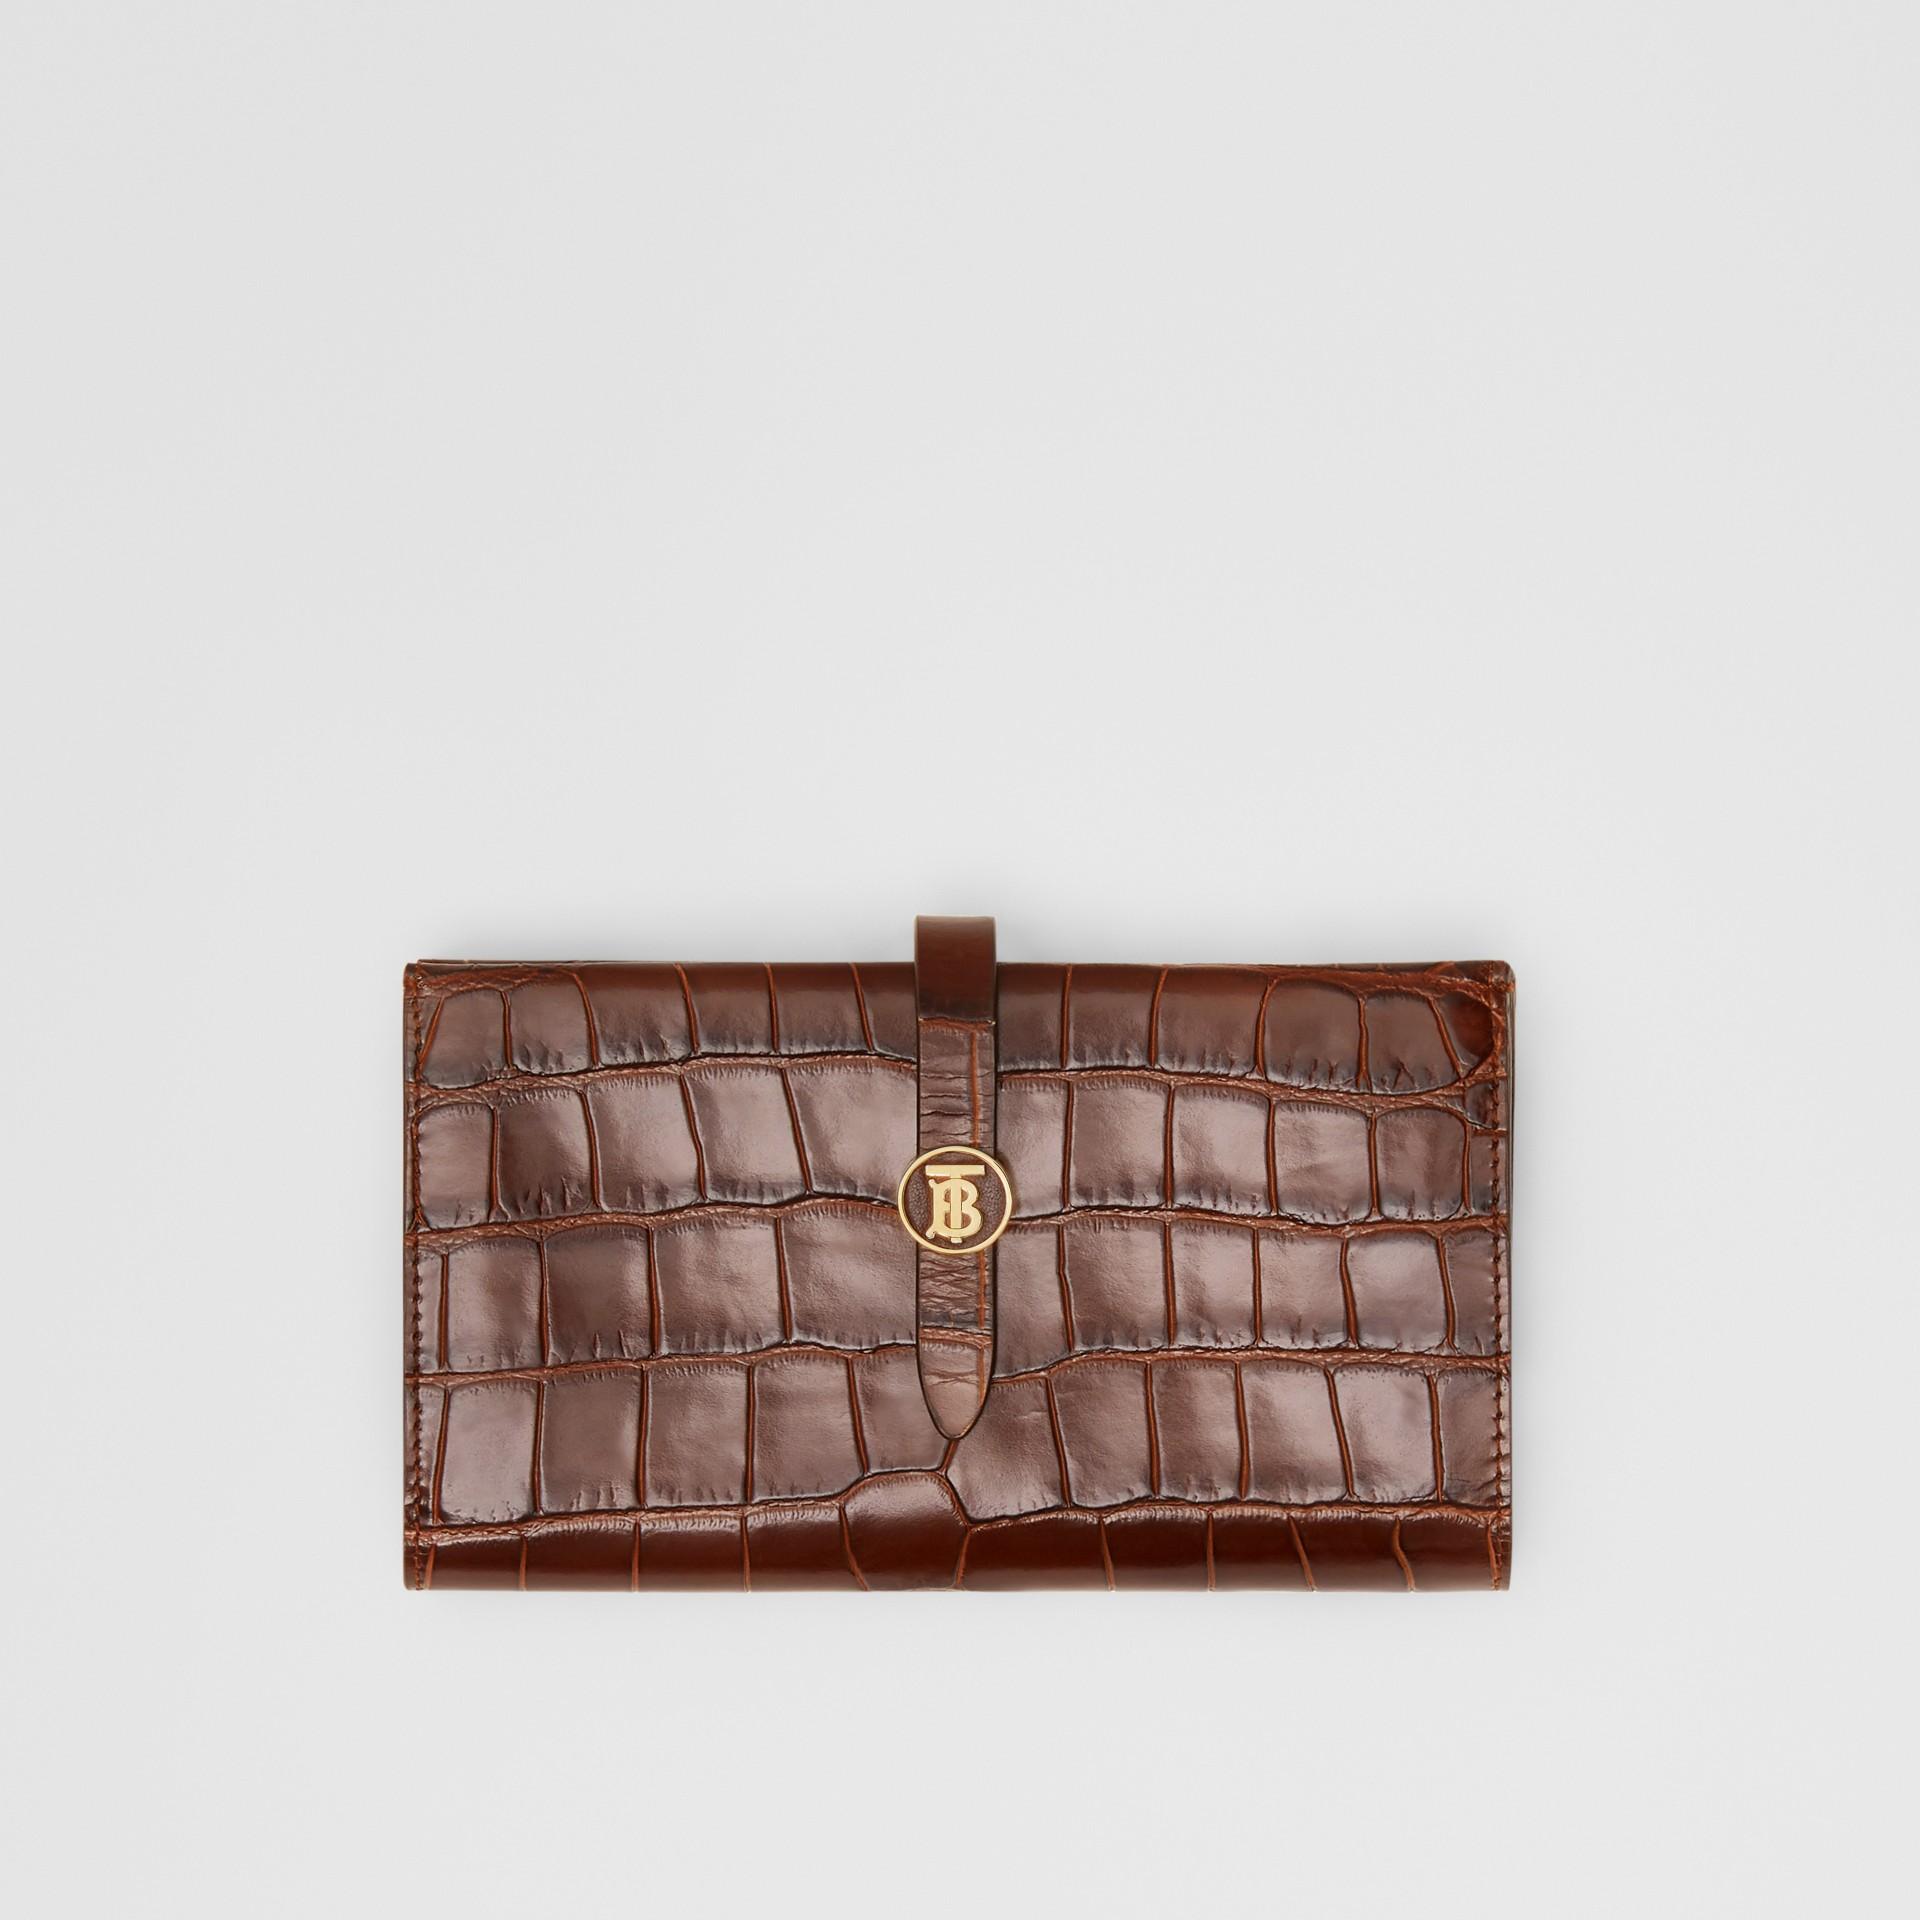 Monogram Motif Embossed Leather Folding Wallet in Tan - Women | Burberry - gallery image 0